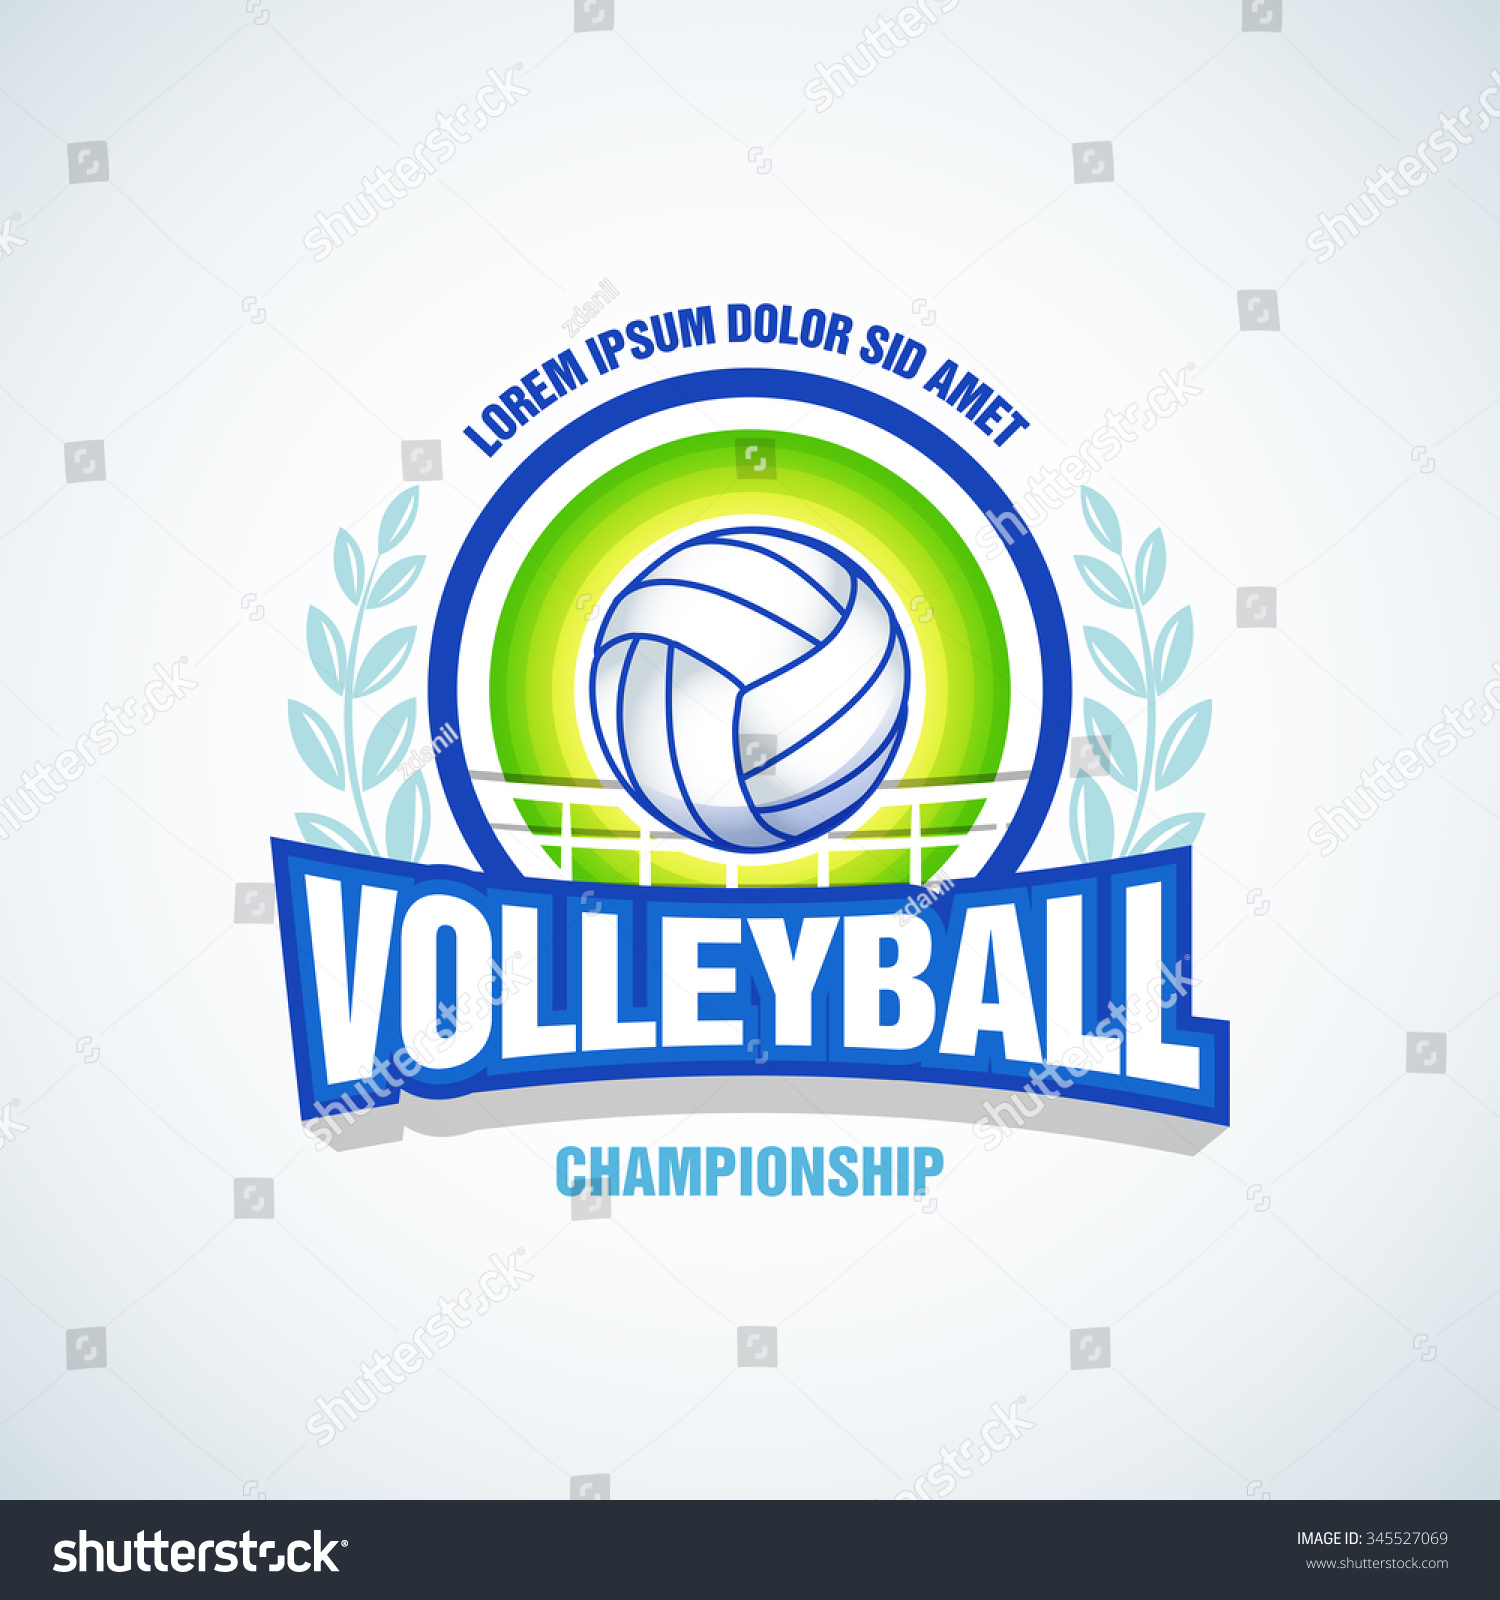 T shirt design volleyball - Volleyball Team Logo Template Volleyball Emblem Logotype Template T Shirt Apparel Design